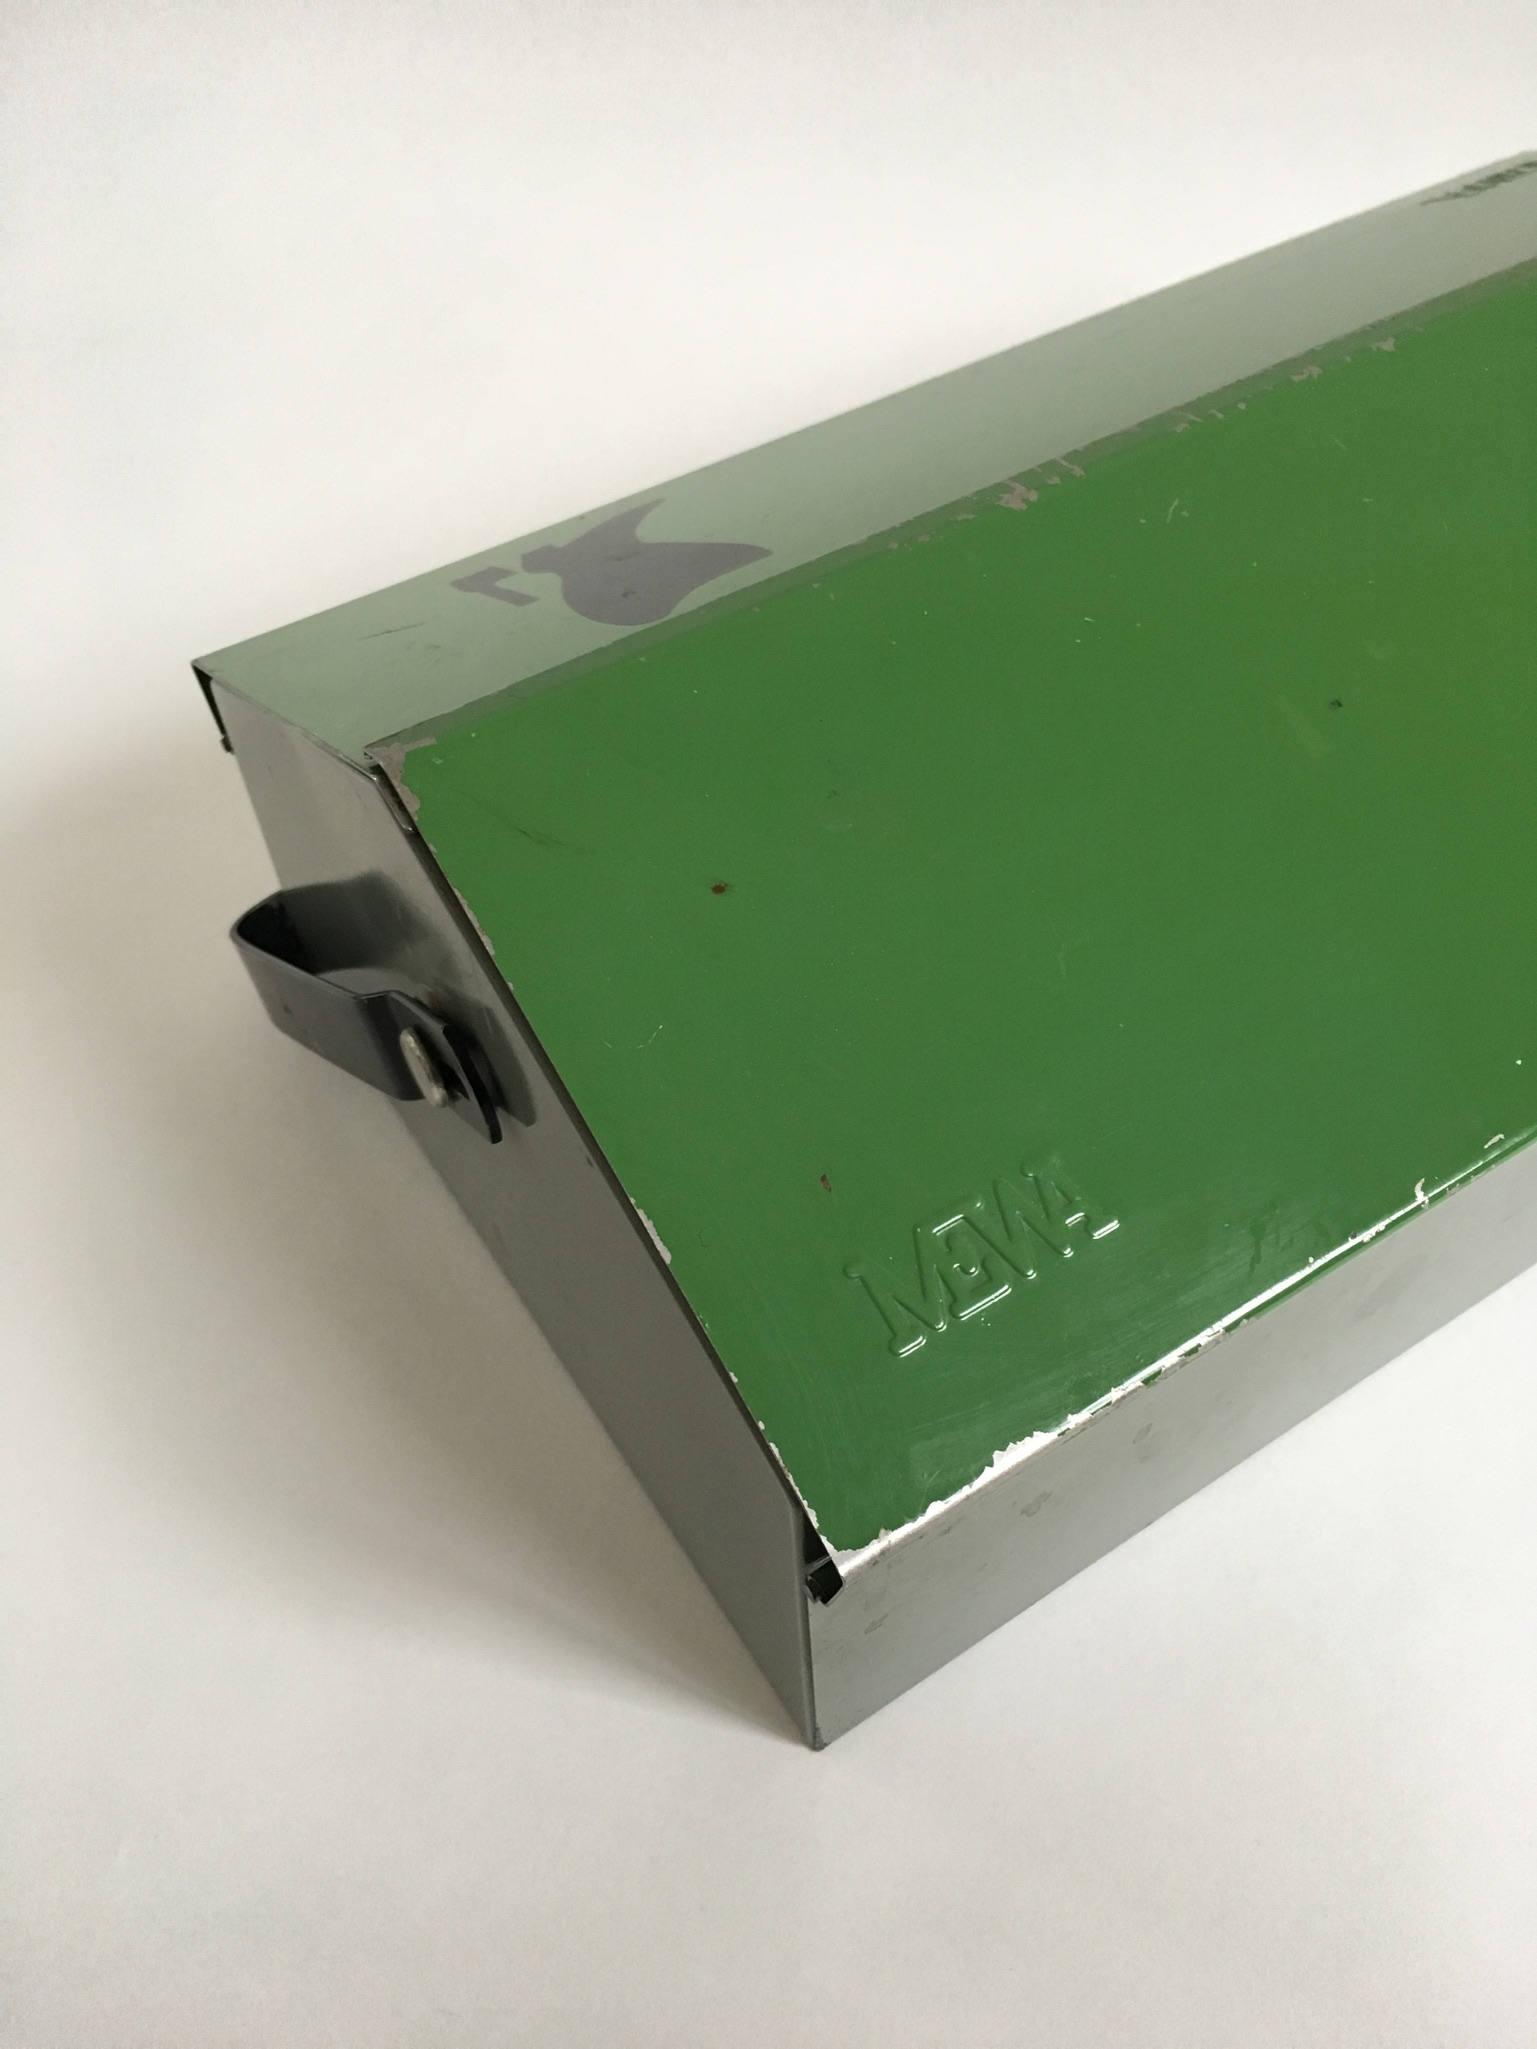 mewa wilhelm kienzle green outil metal box, chaussure boîte boîte